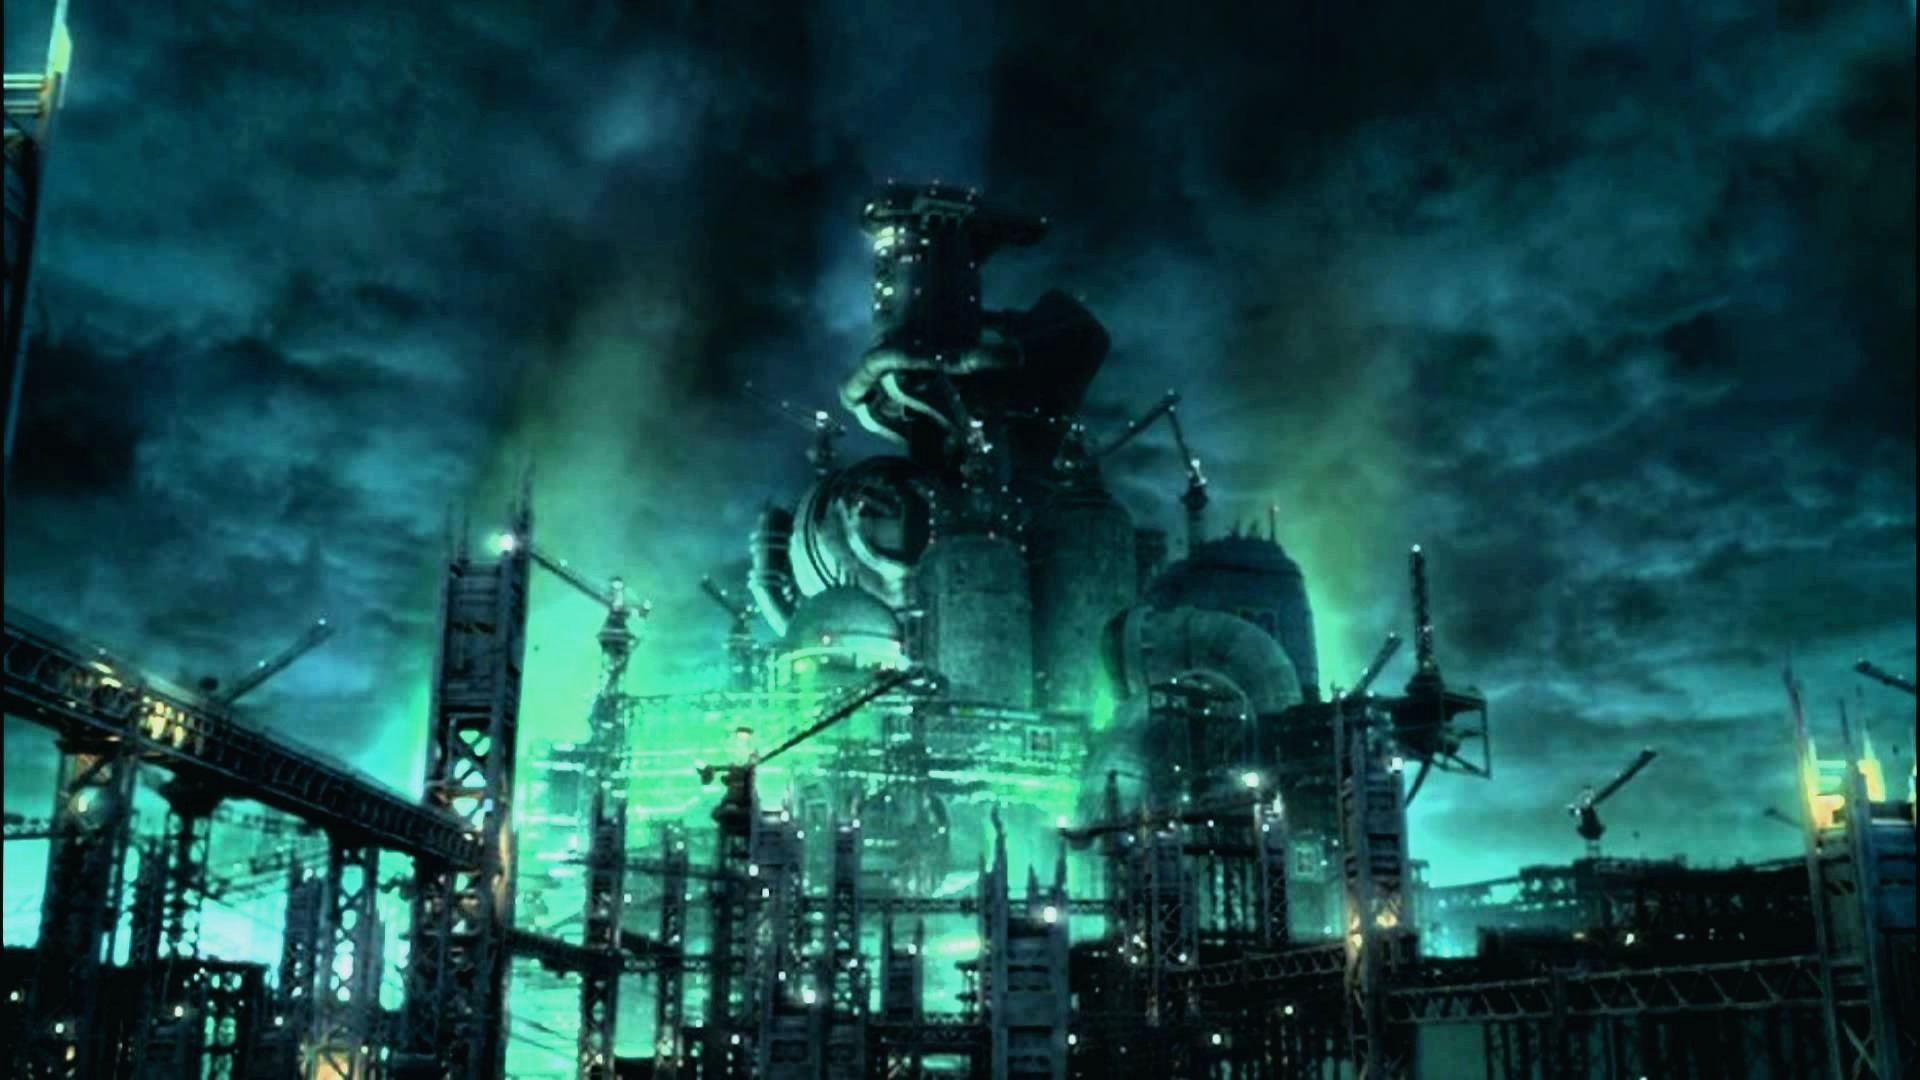 Final Fantasy 7 Wallpaper HD (78+ Images